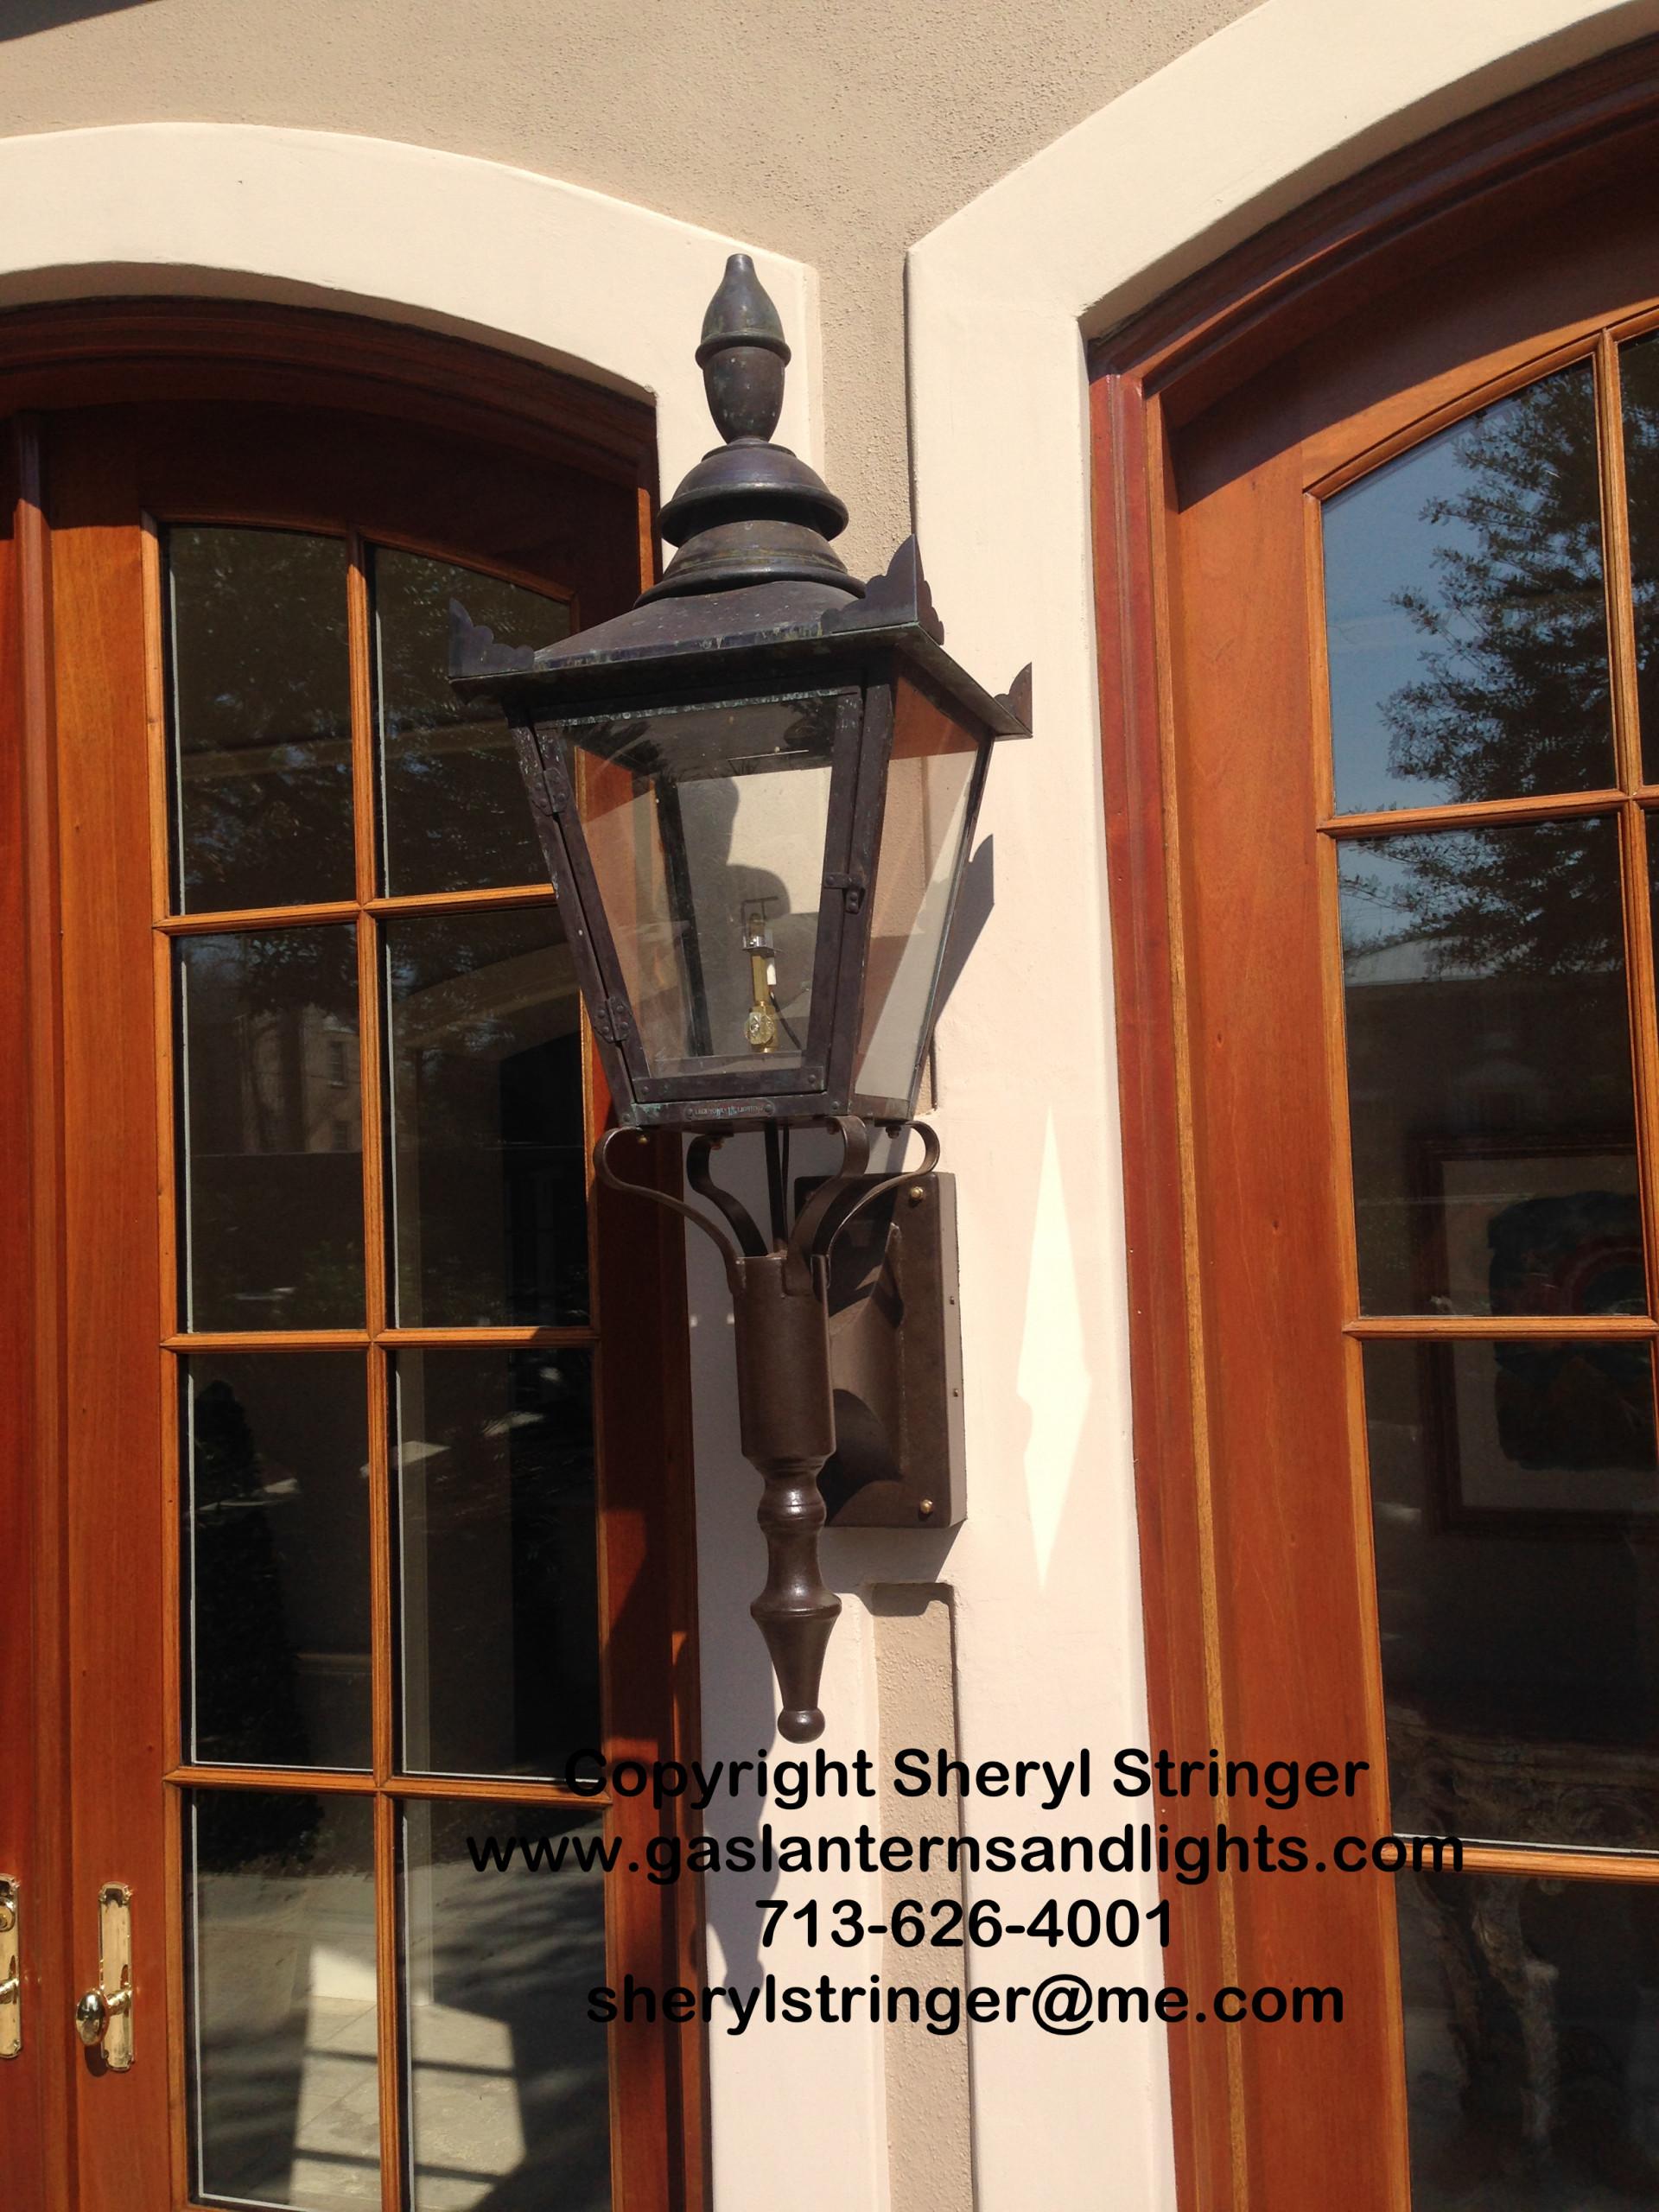 Sheryl's Lancaster Gas Lantern on Steel Bracket